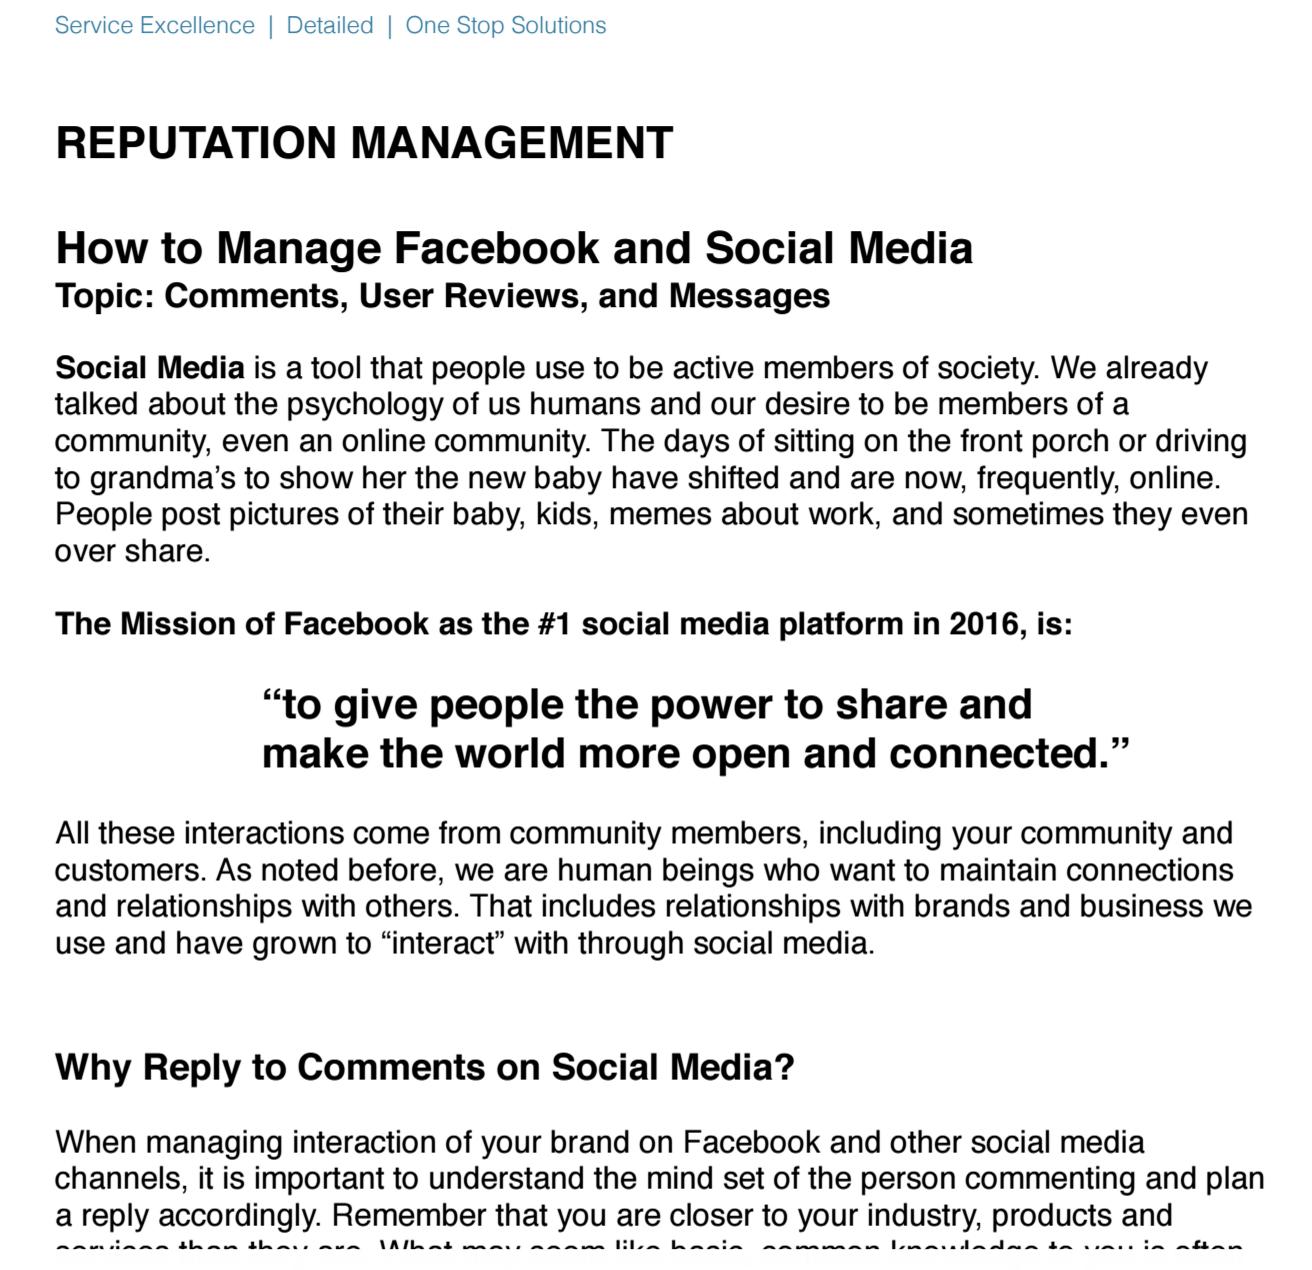 reputation management | social media | business partnership